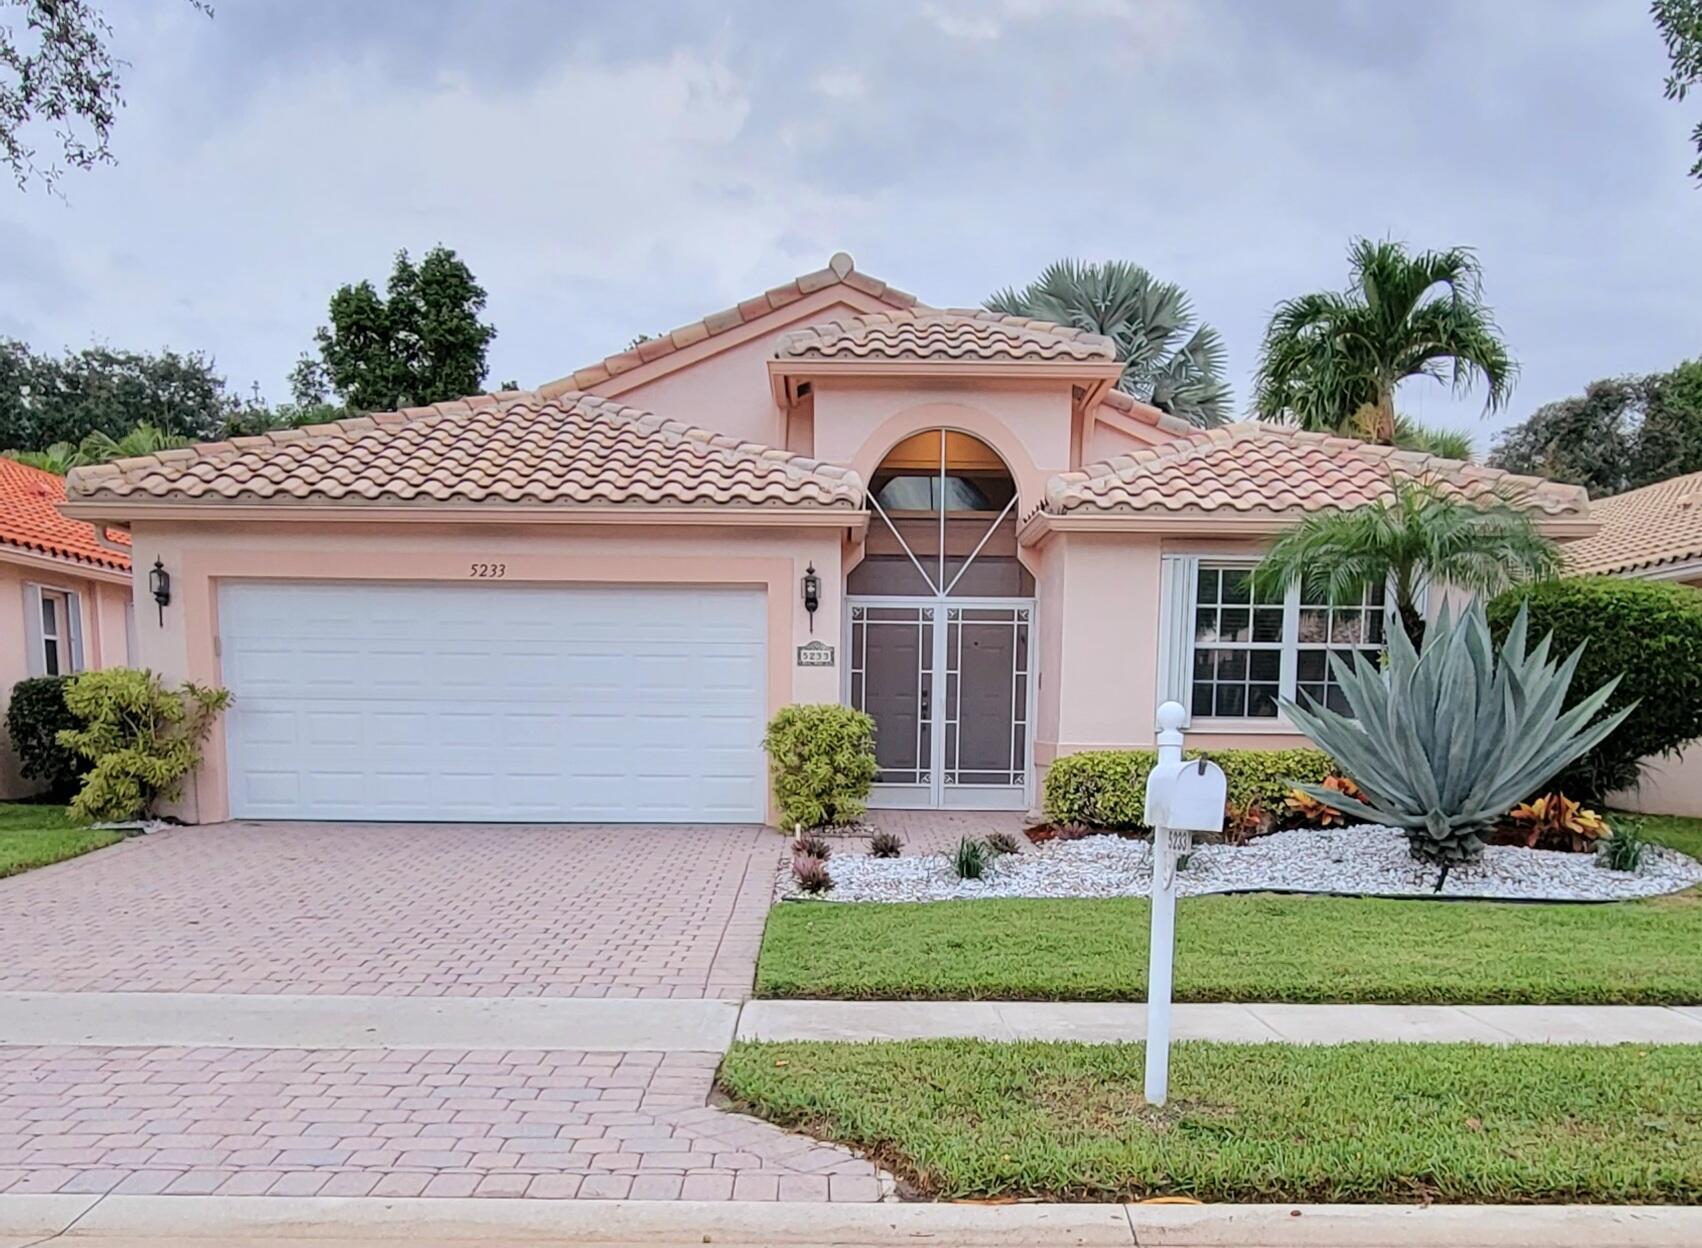 5233  Glenville Drive  For Sale 10747272, FL